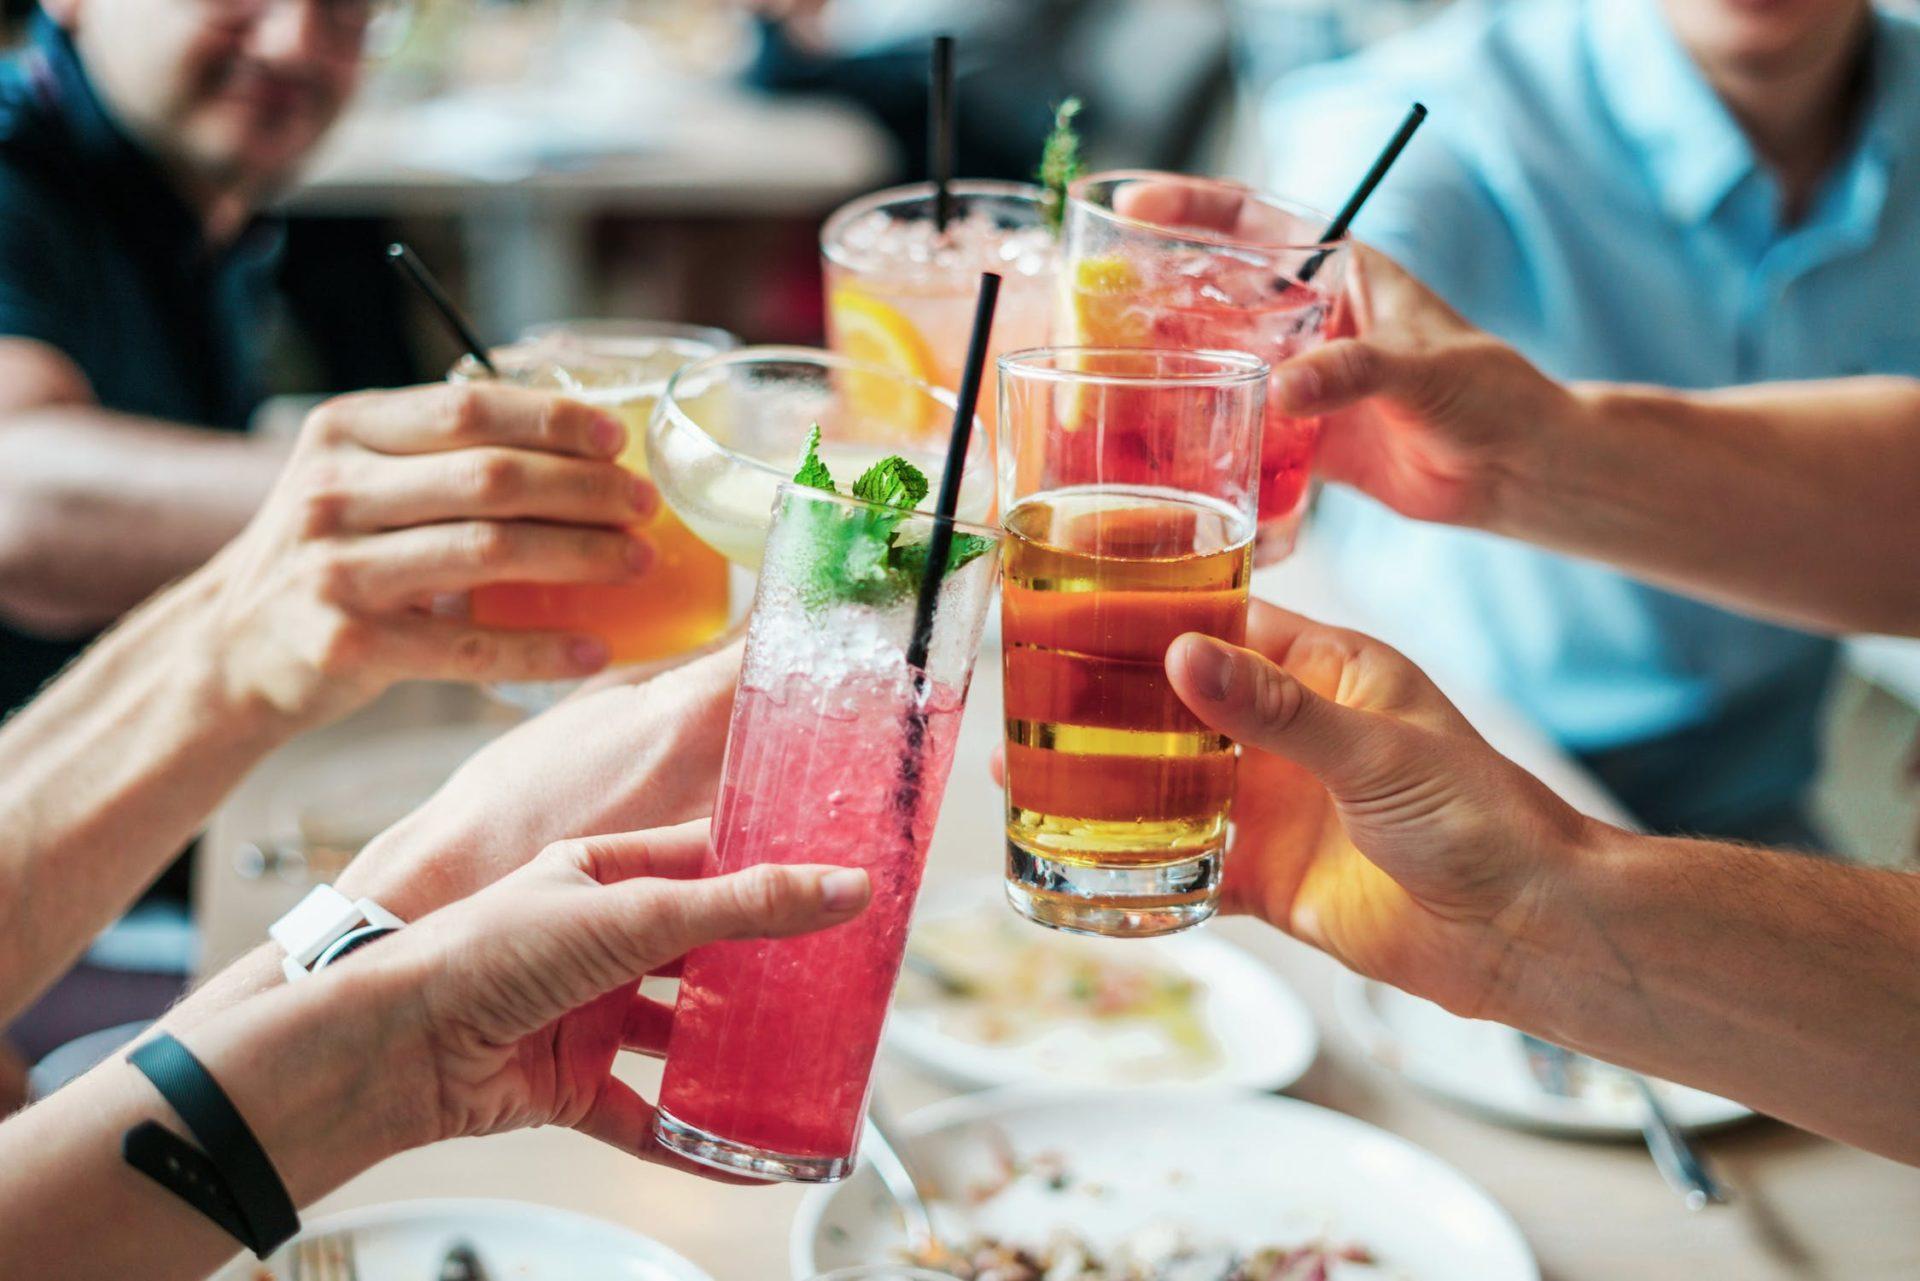 Where to eat and drink in Kingston, Teddington & Richmond?